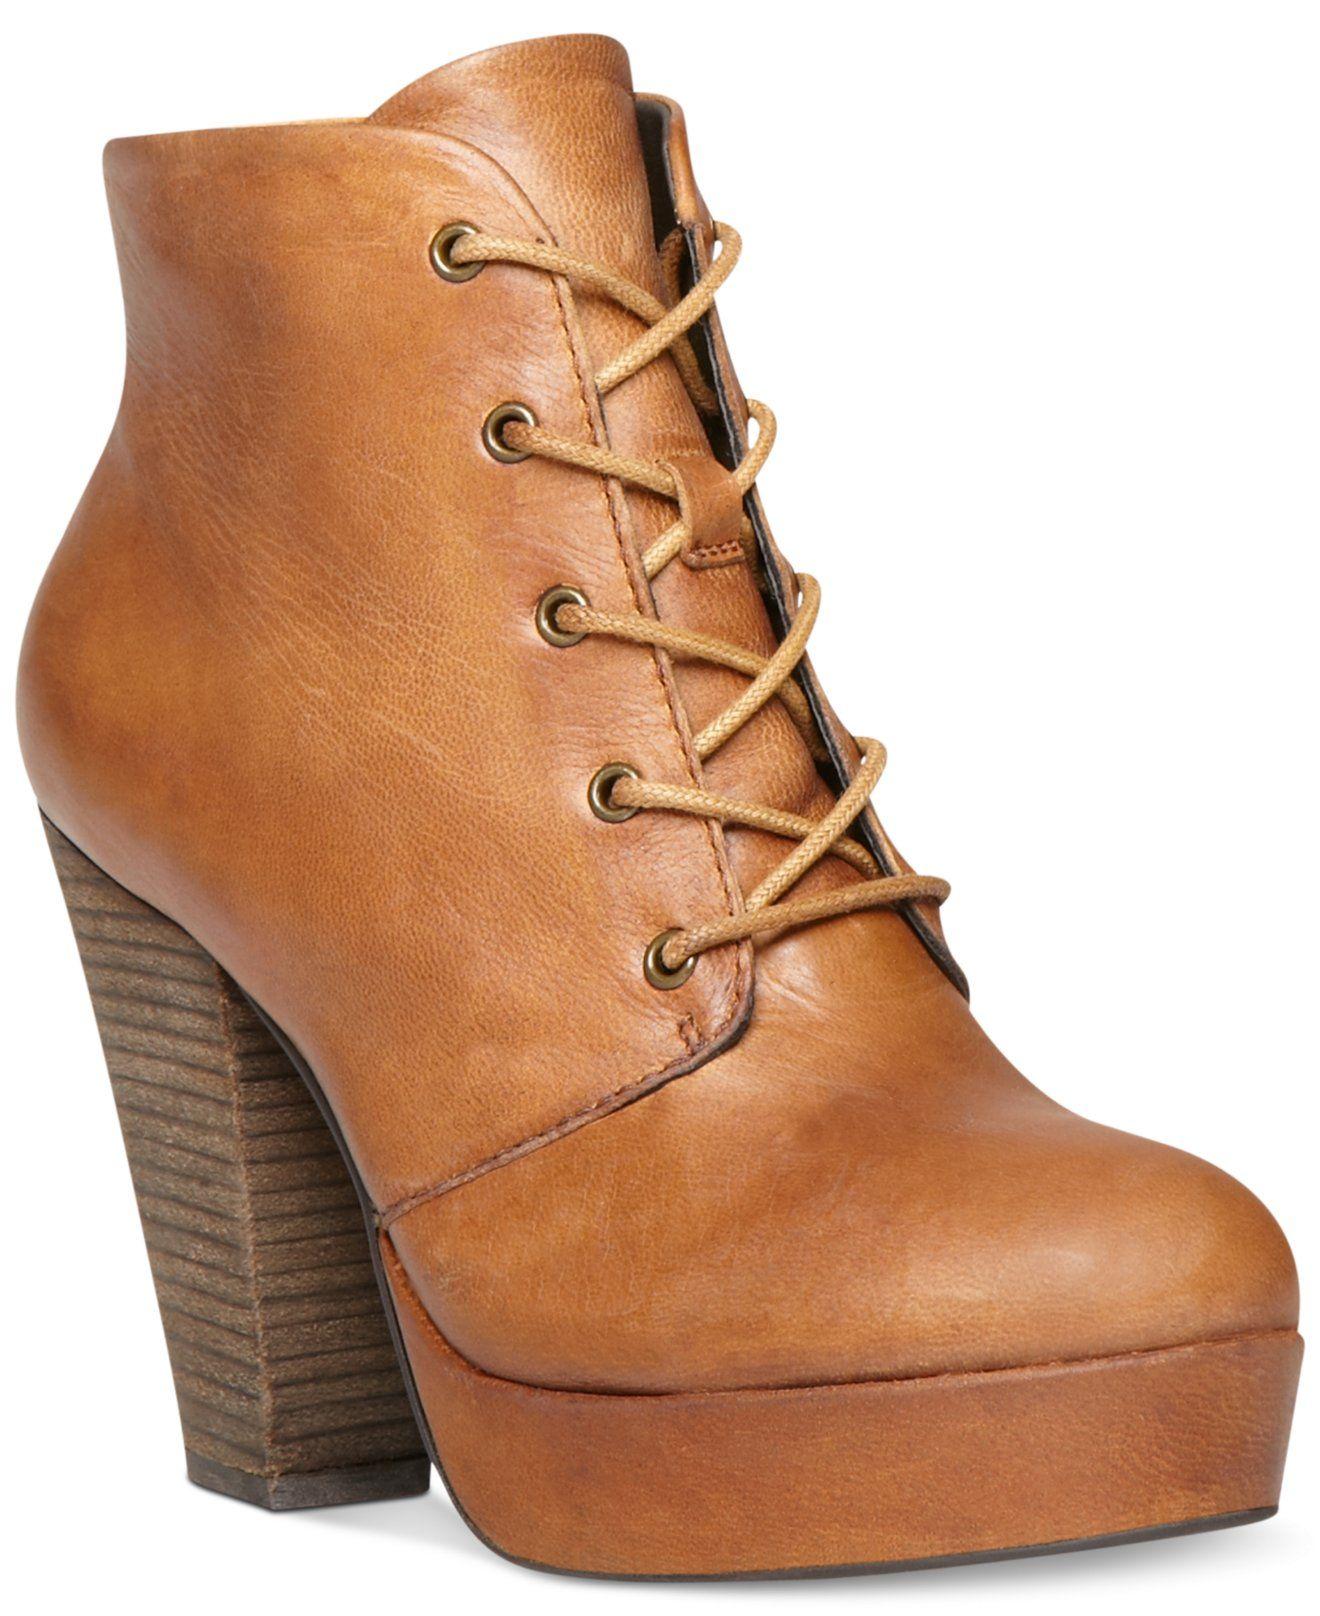 61d8183df03 Steve Madden Raspy Platform Booties - Steve Madden - Shoes - Macy's ...